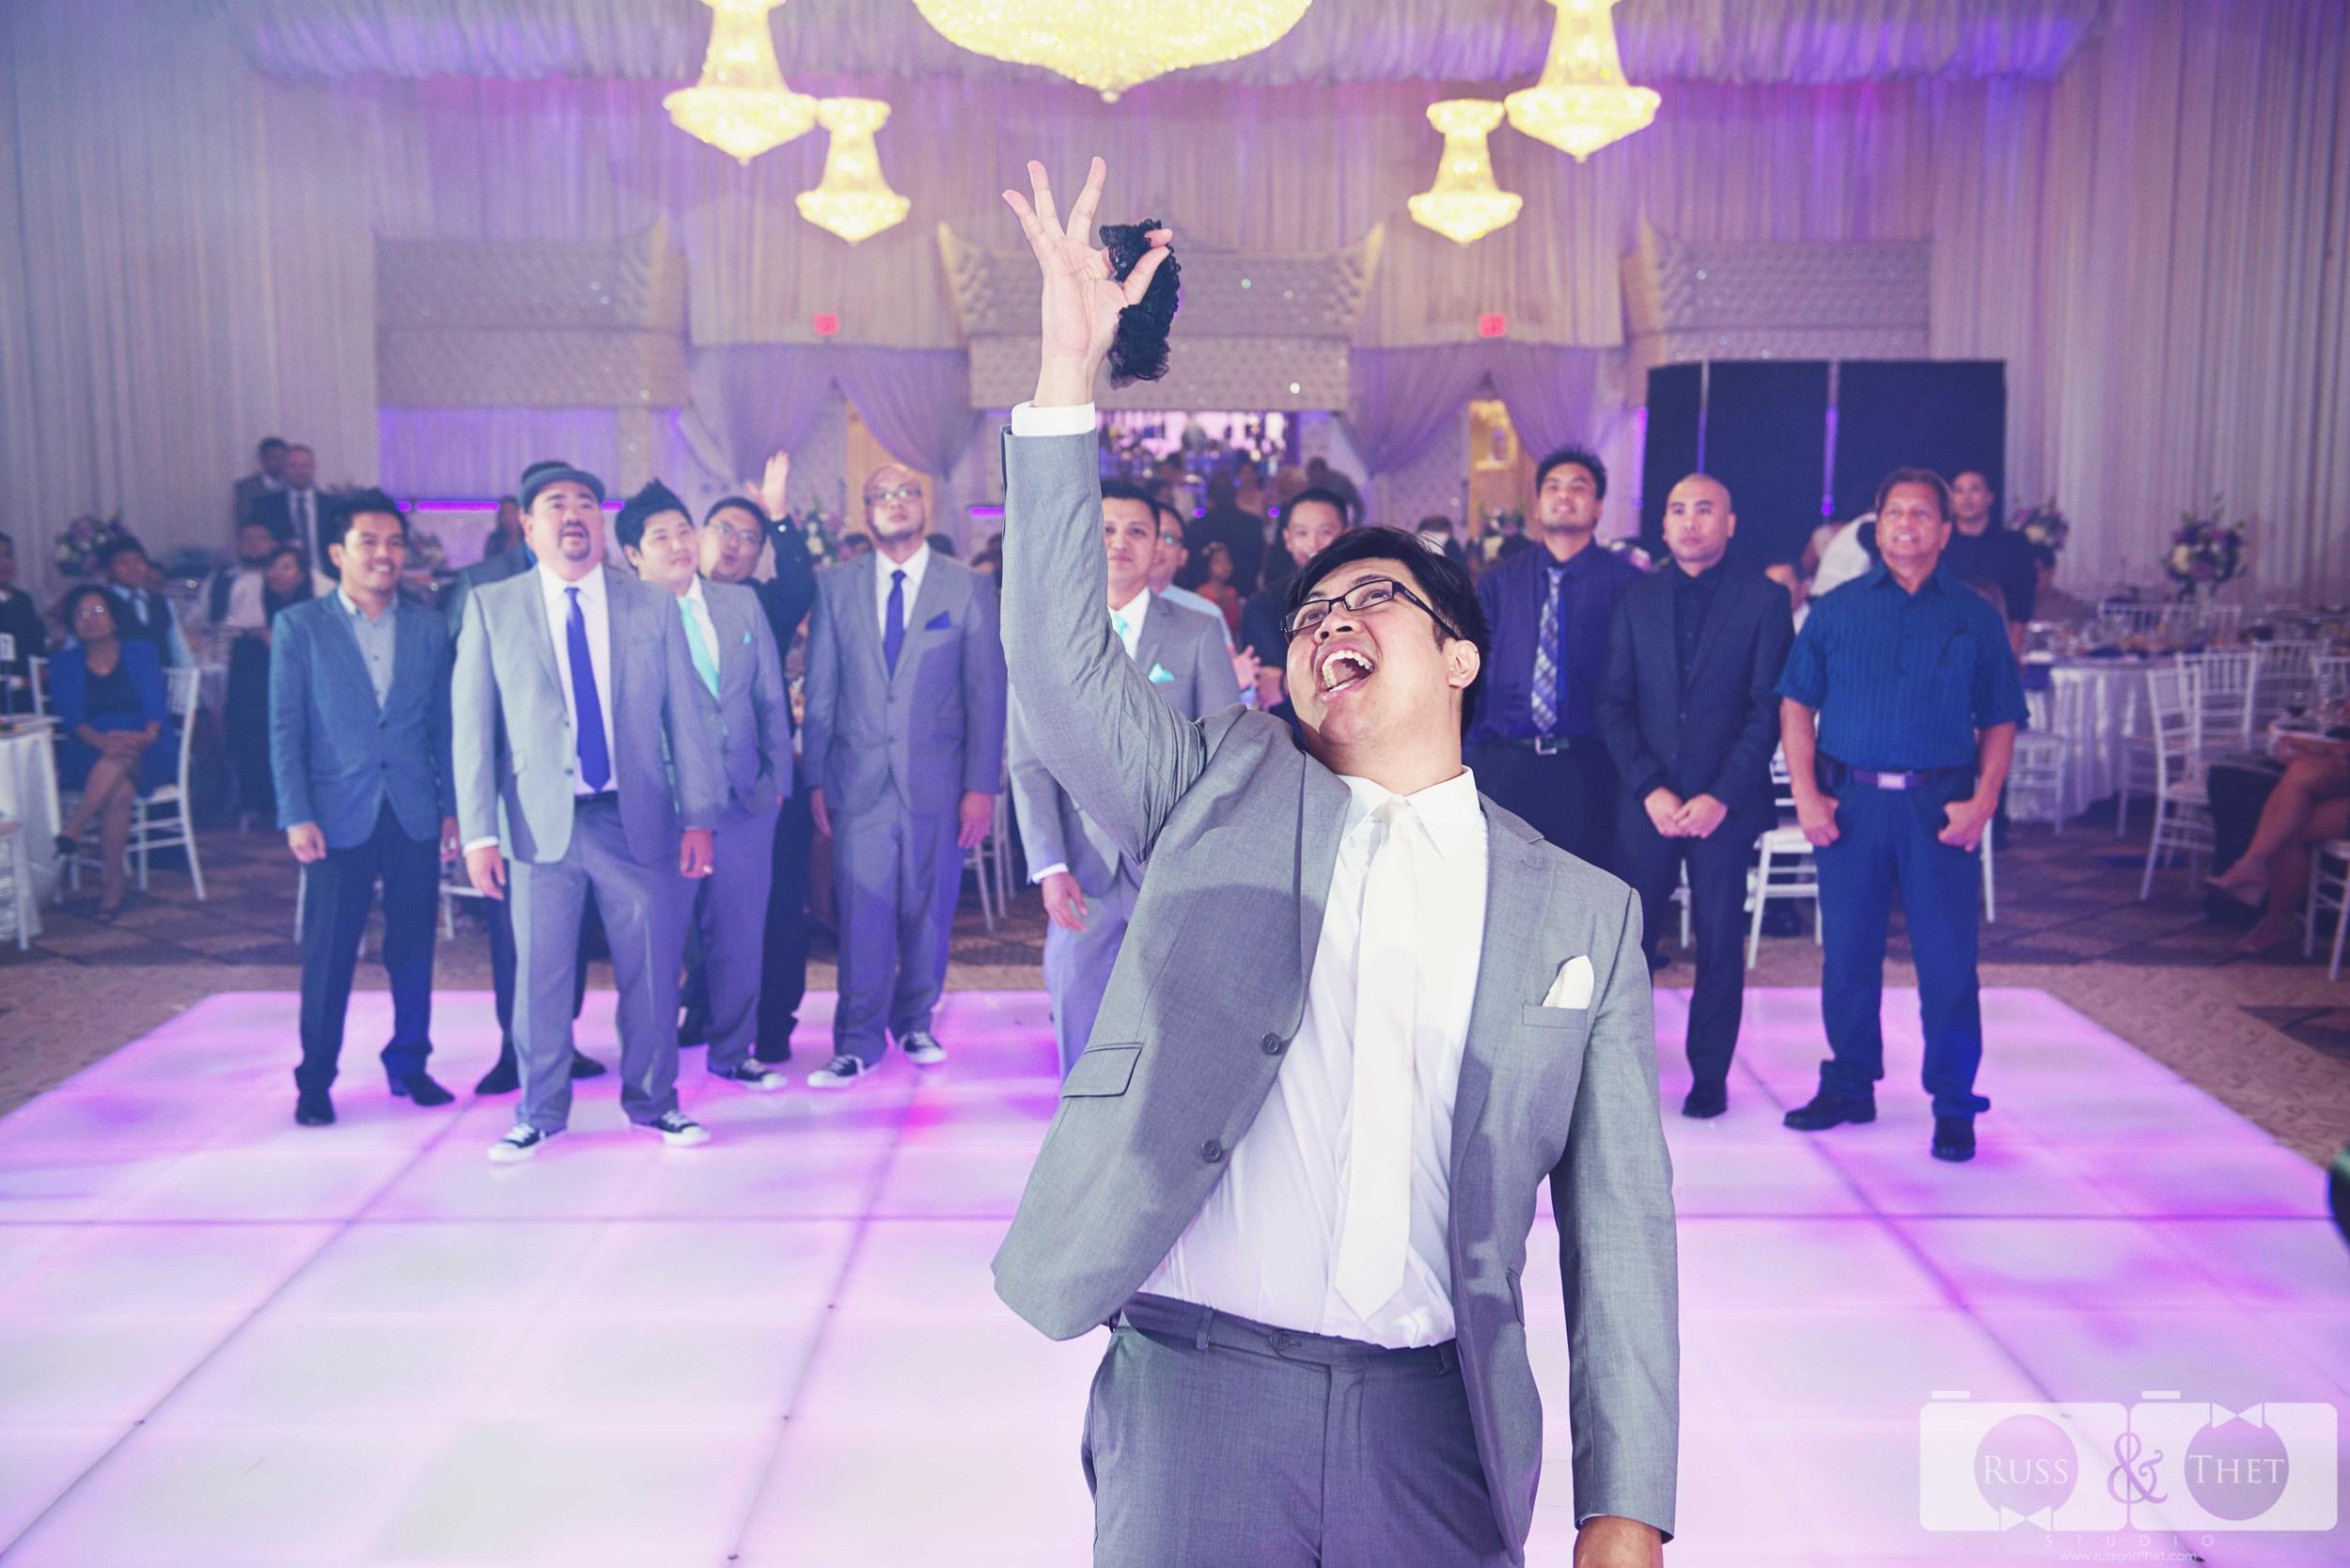 royal-palace-banquet-hall-glendale-wedding-70.JPG